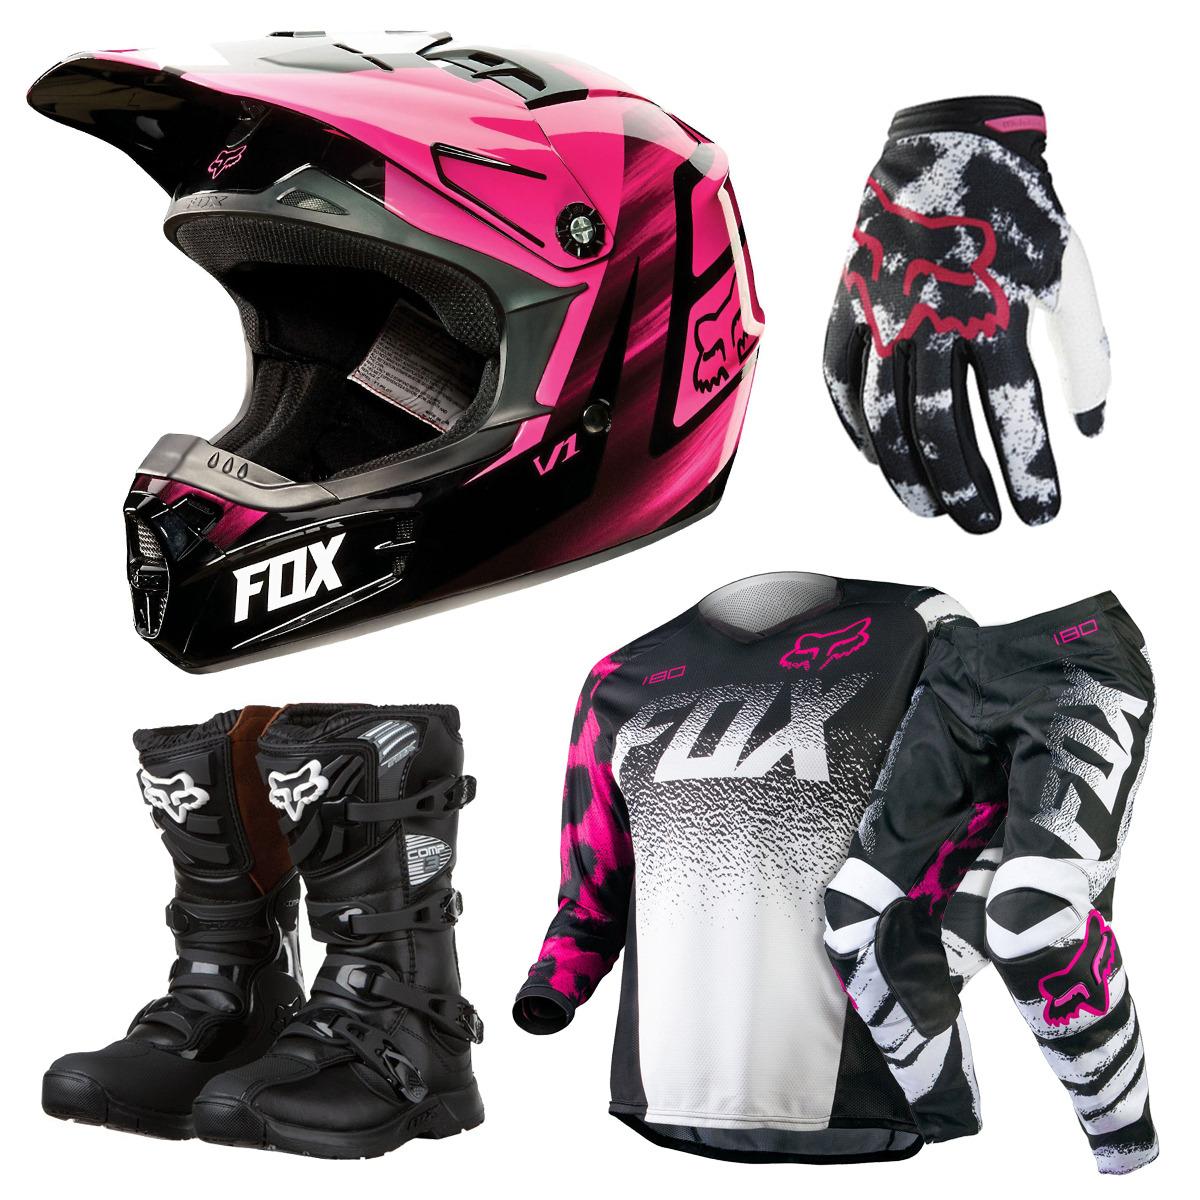 Motocross Gear Combos Women Images